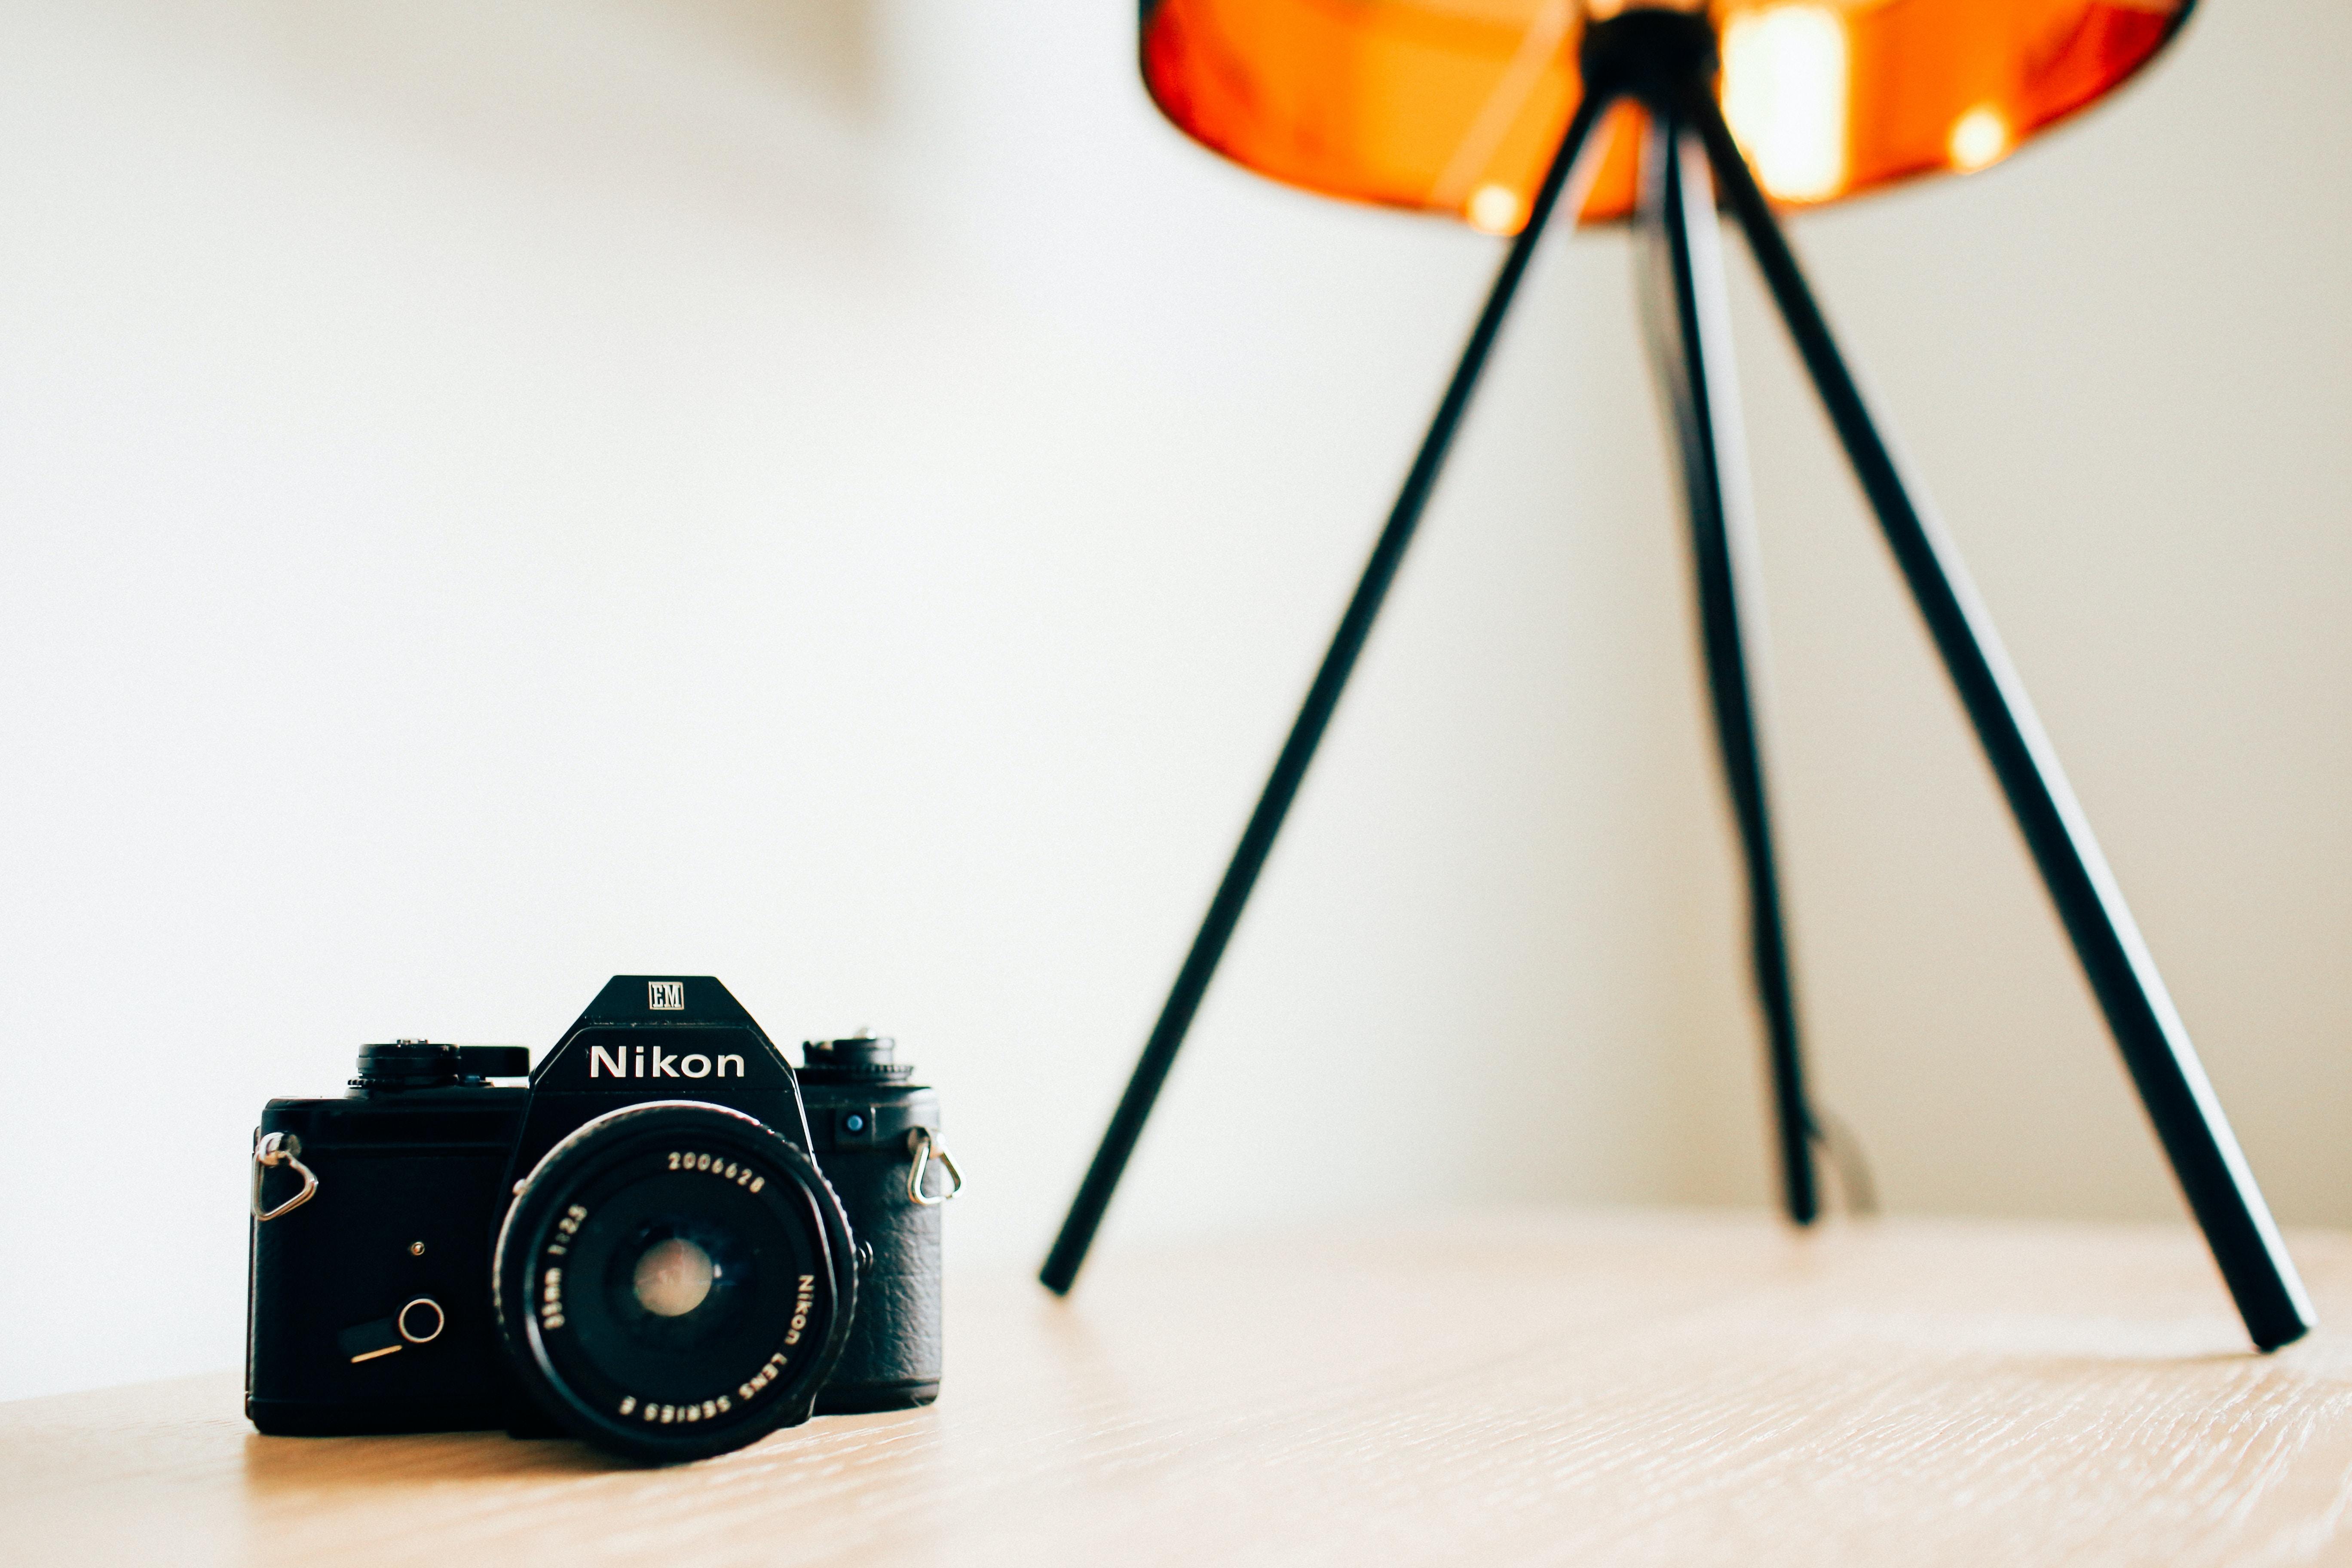 Nikon camera on a table with a tripod